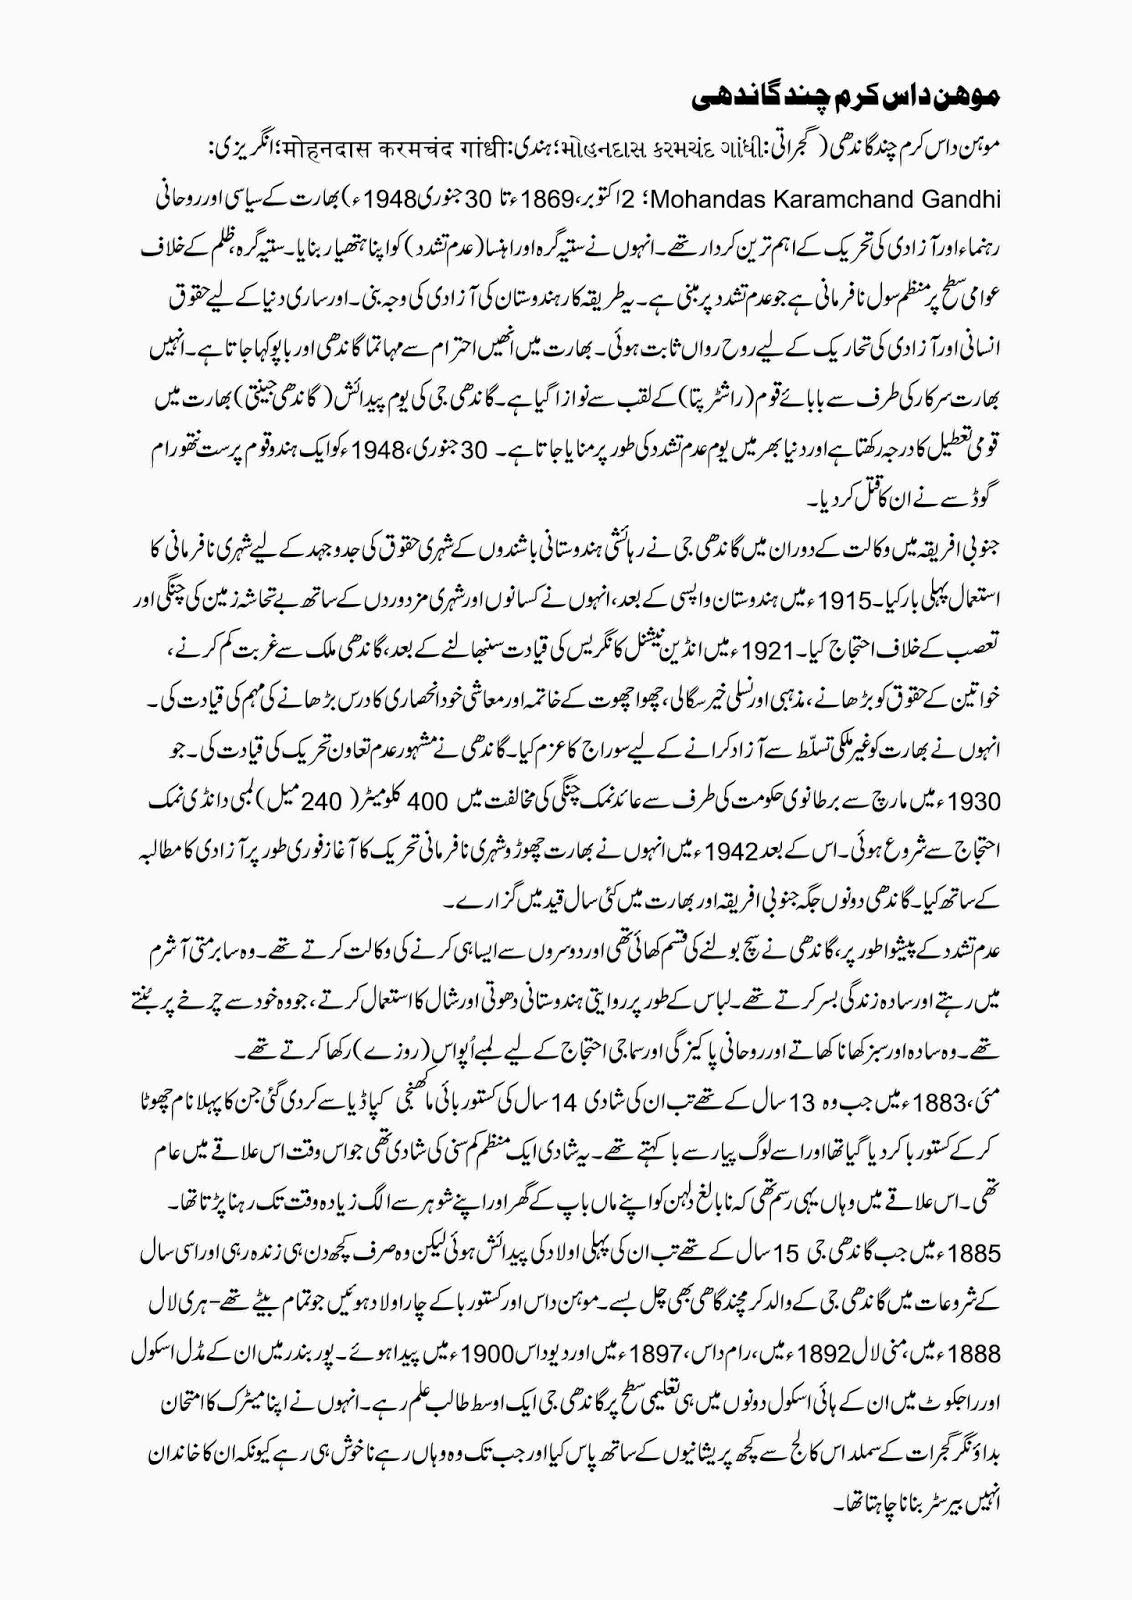 004 Essay Example Essay2bmahatma2bgandhi2burdu2b1 Mahatma Magnificent Gandhi Conclusion In English 1000 Words Pdf Hindi 5 Lines Full